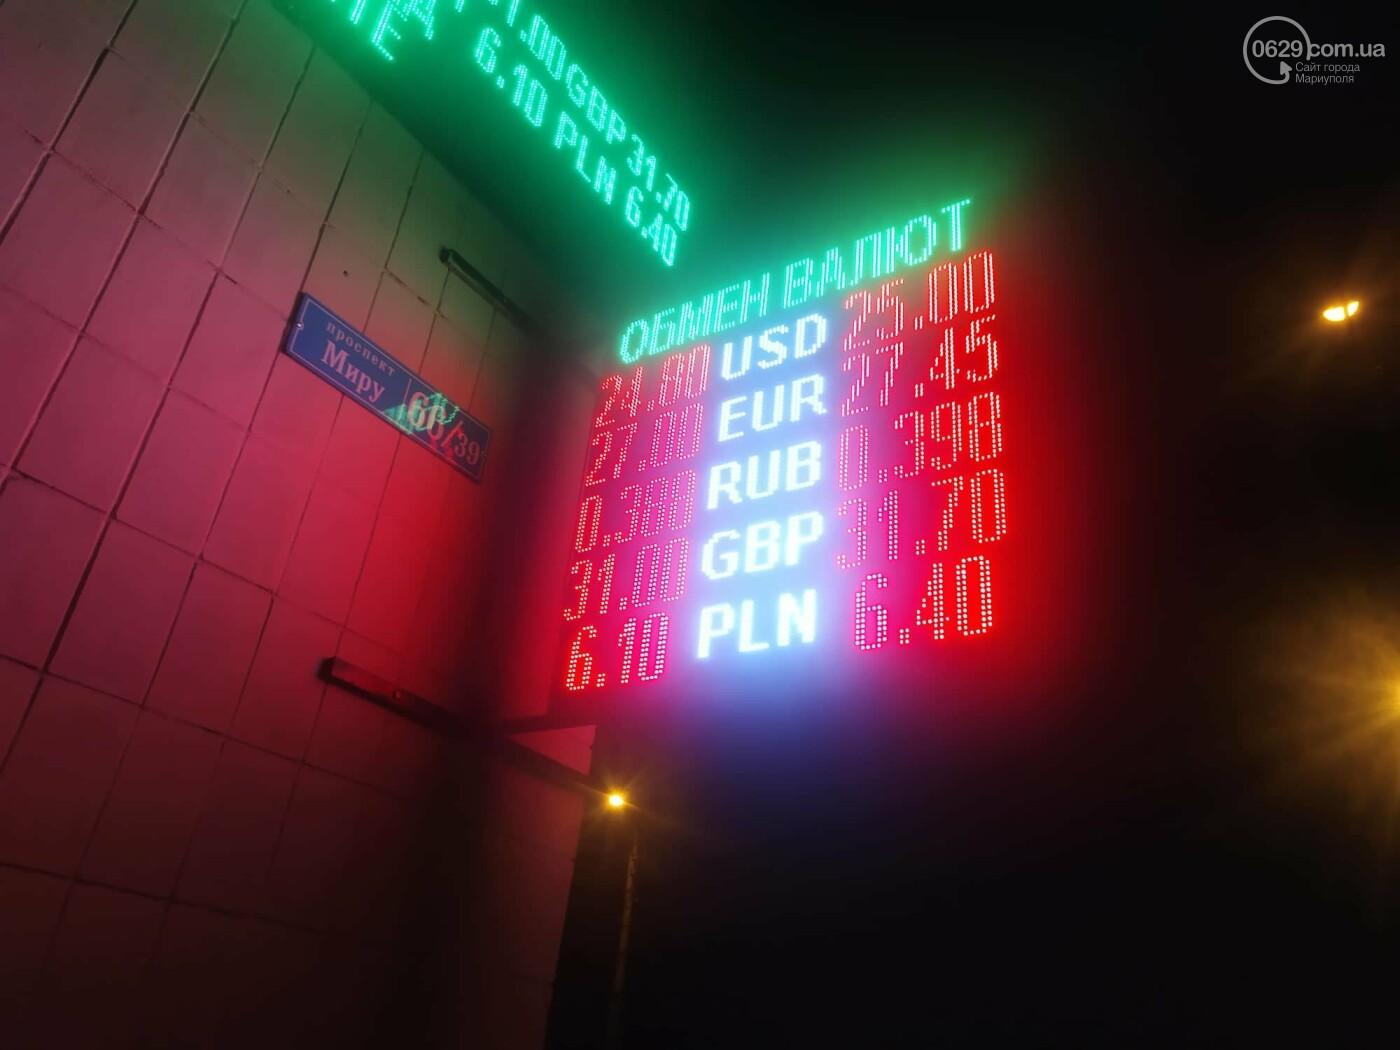 Курс доллара в Мариуполе вырос до 25 гривен, - ФОТО, фото-2